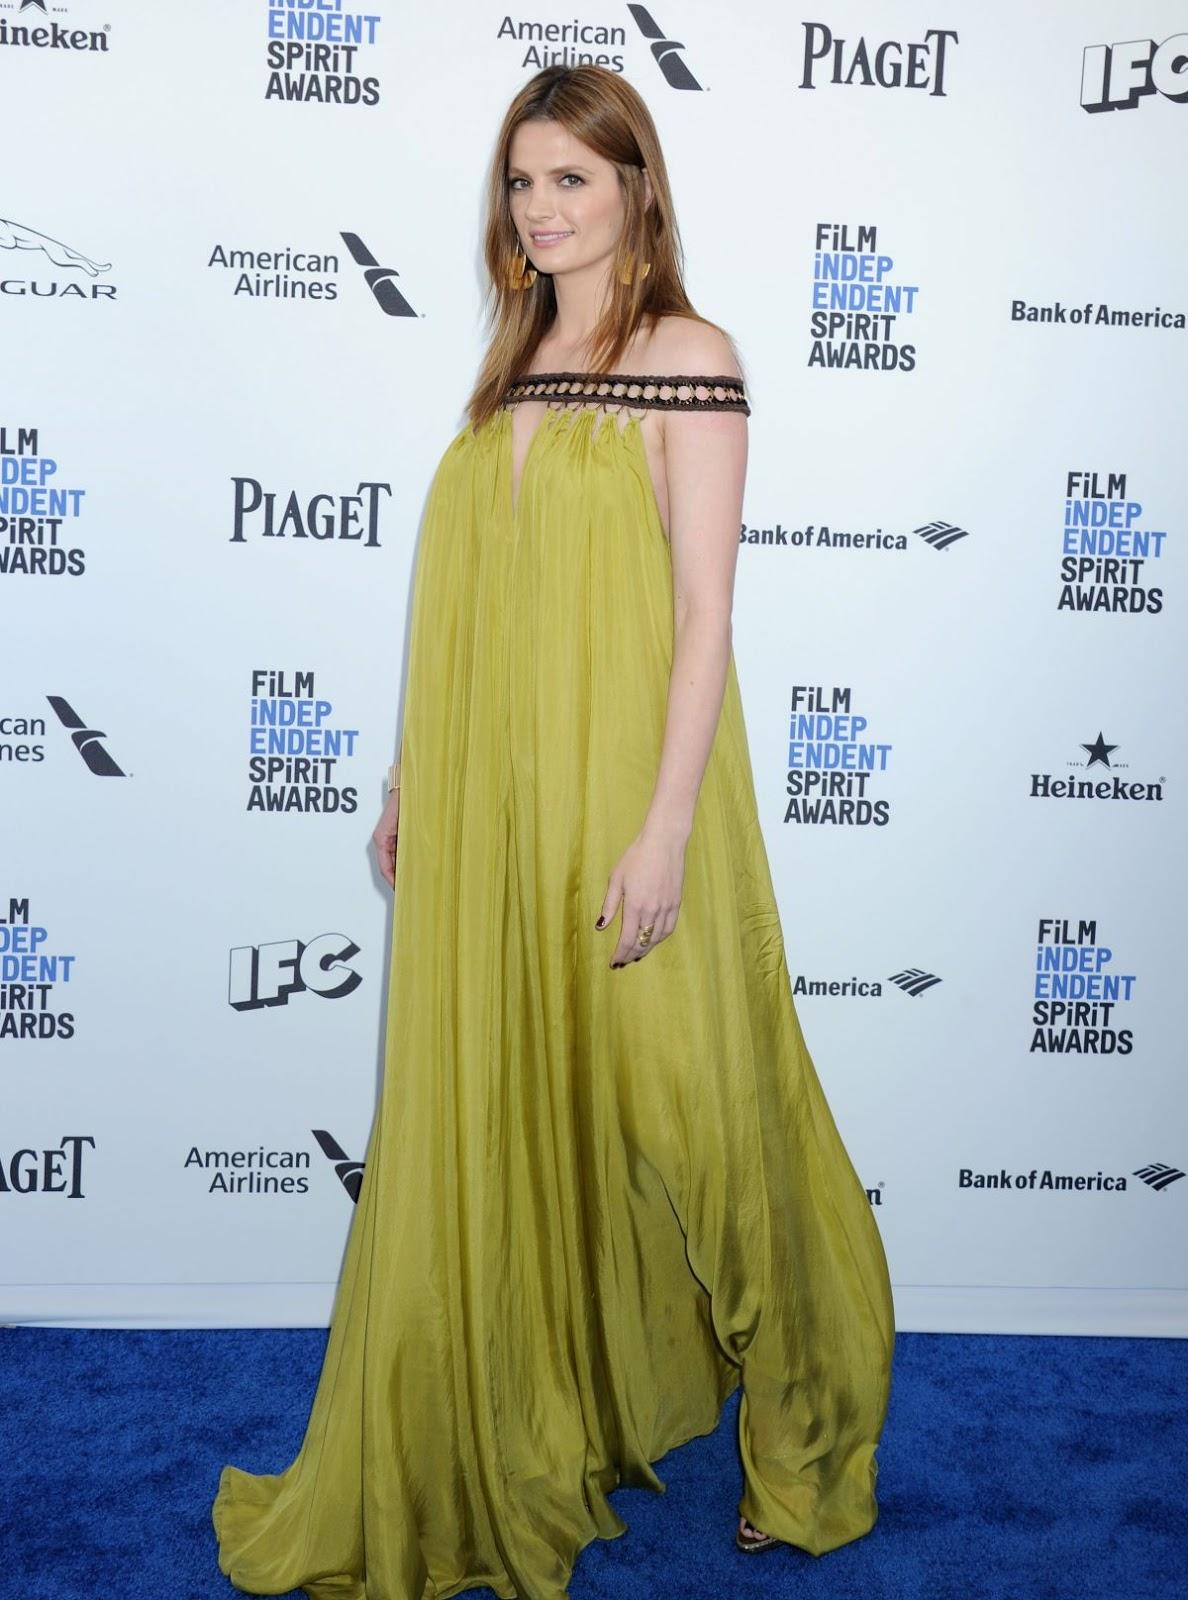 Stana Katic at Film Independent Spirit Awards in Santa Monica